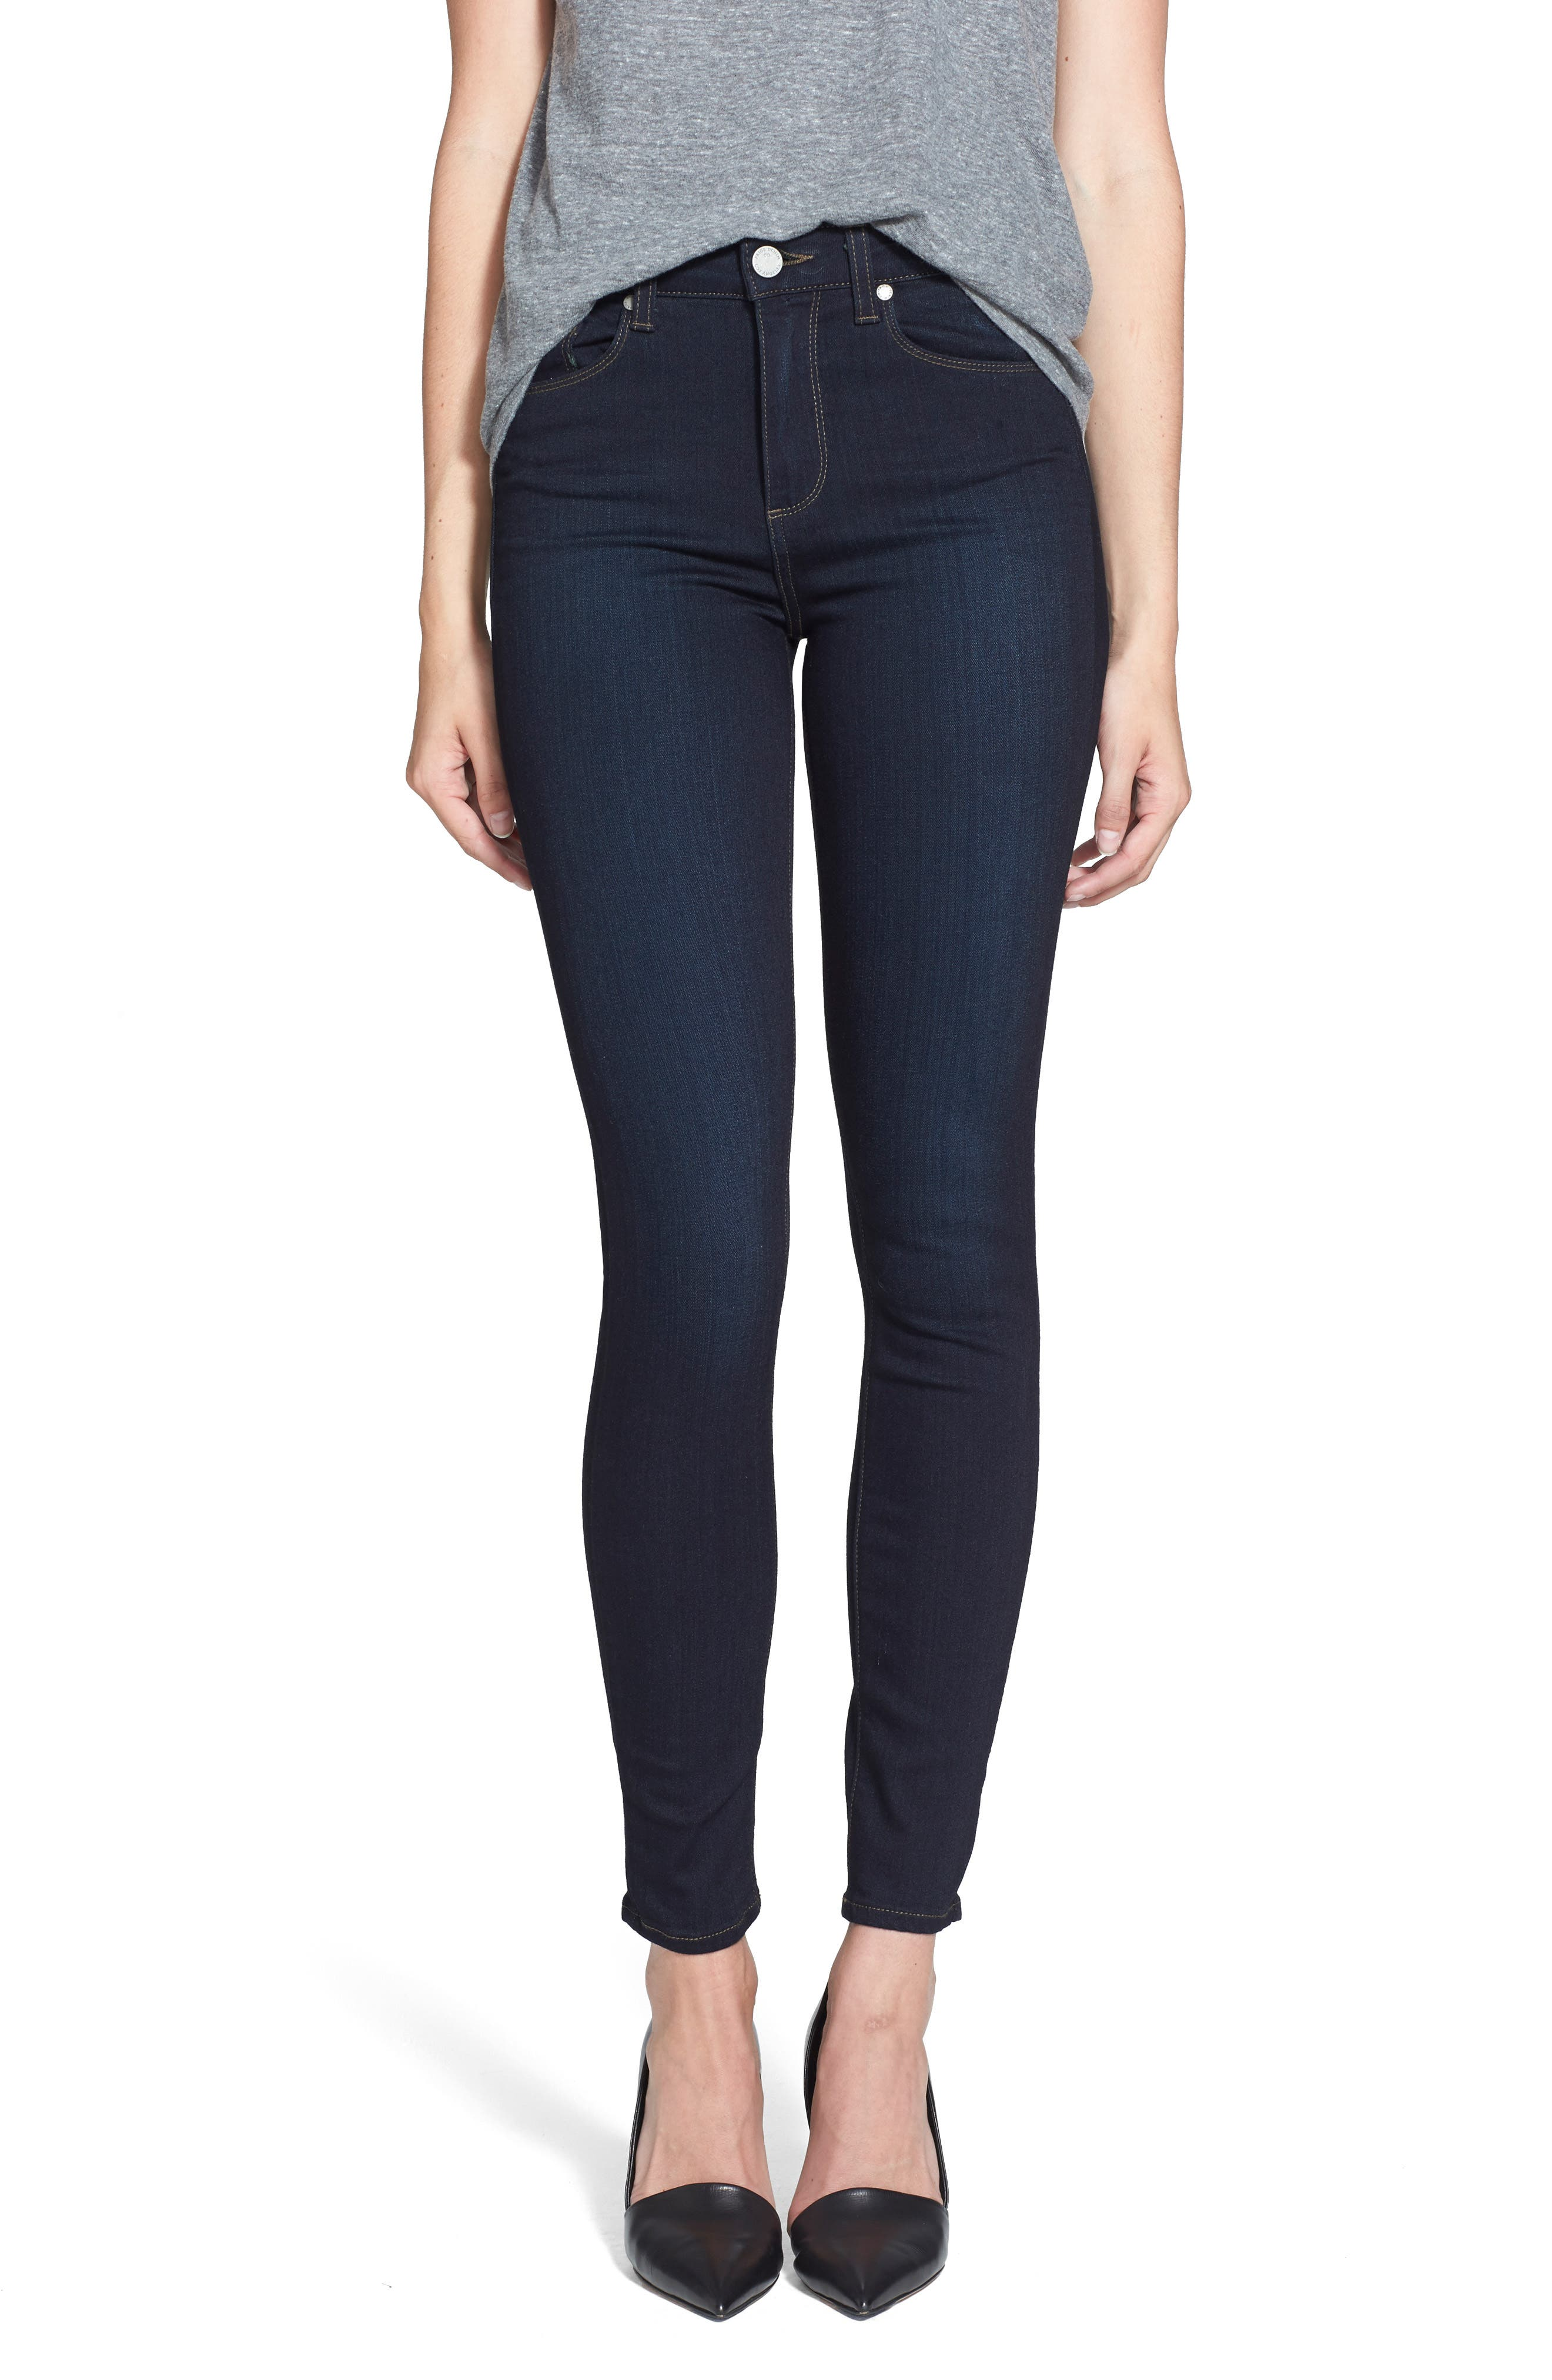 Transcend - Hoxton High Waist Ultra Skinny Jeans,                             Alternate thumbnail 2, color,                             MONA